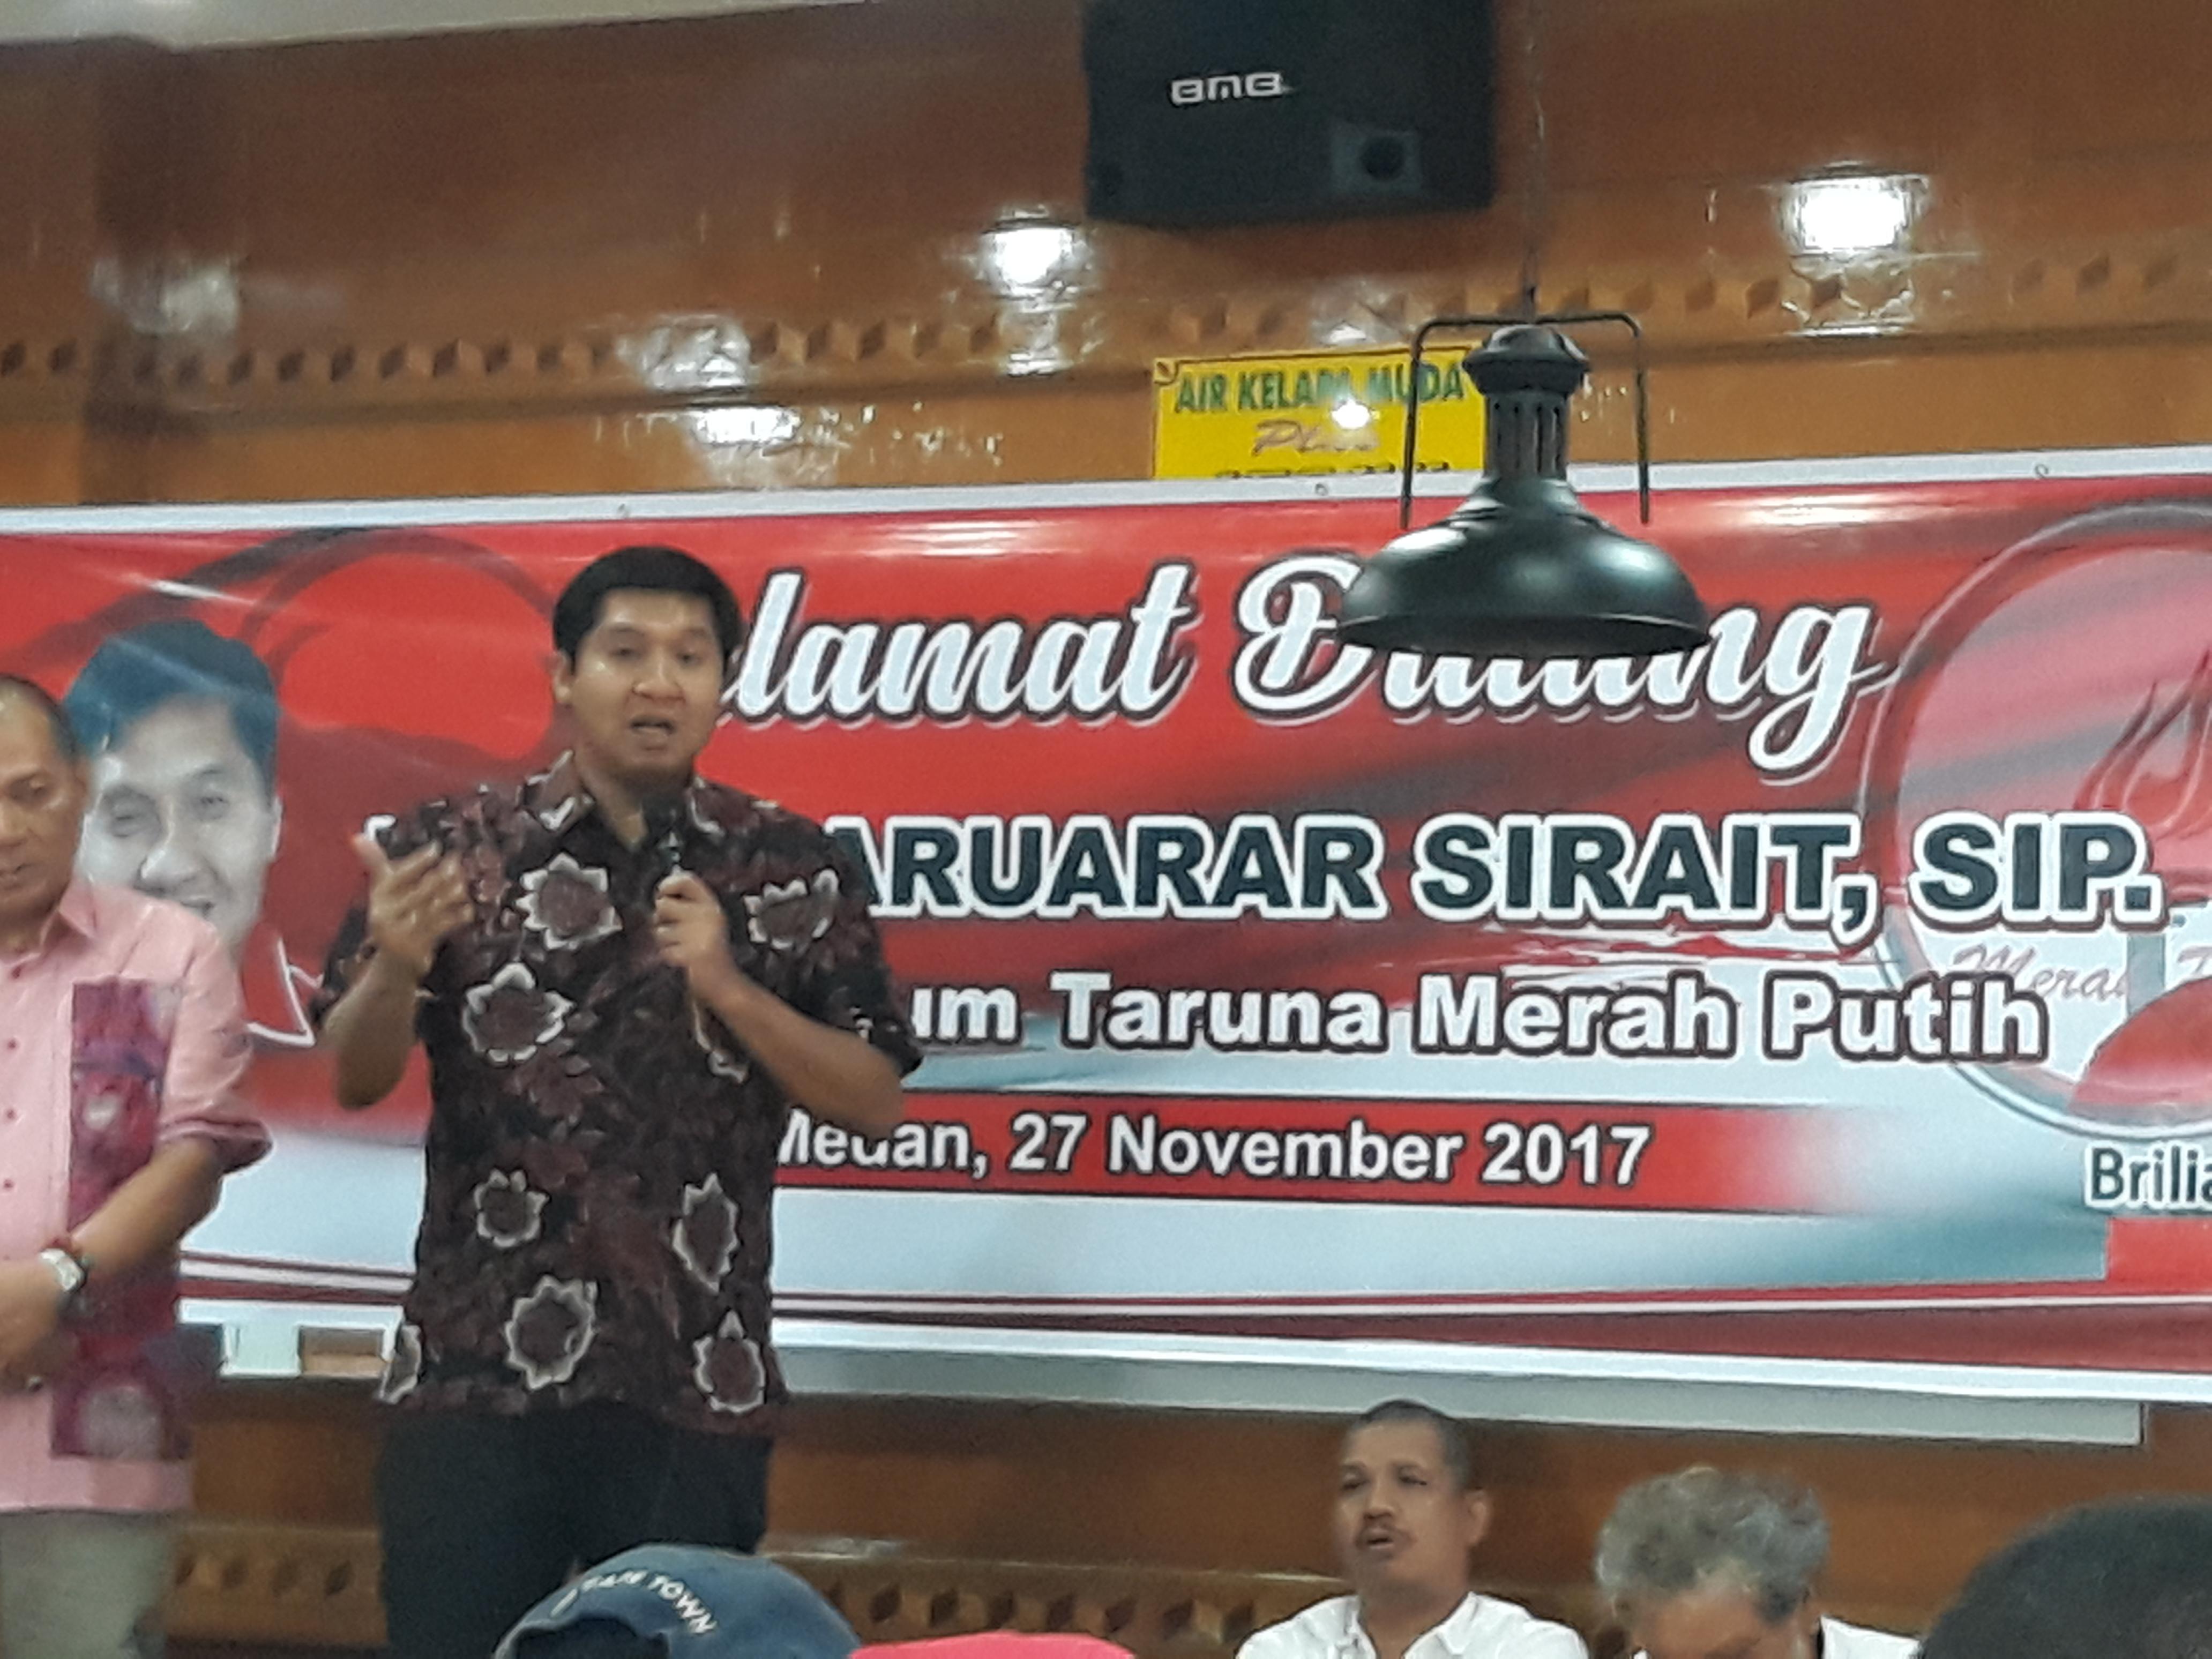 Ketua Umum DPP TMP Maruarar Sirait: TMP Sumut Harus Mampu Menjadi Pembuat Sejarah